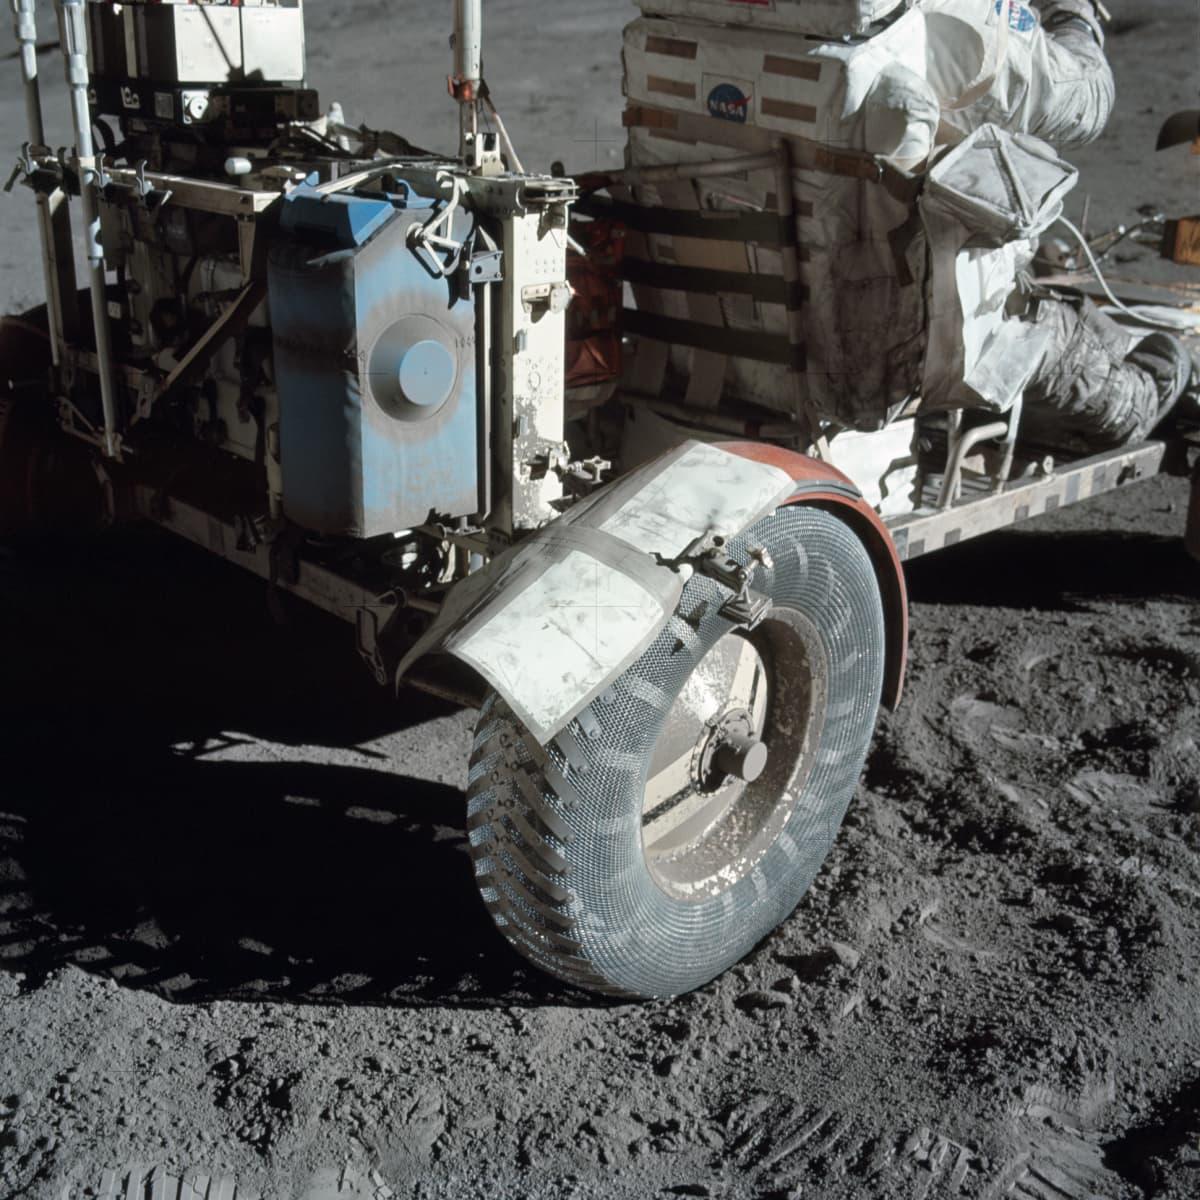 Lunar lokari